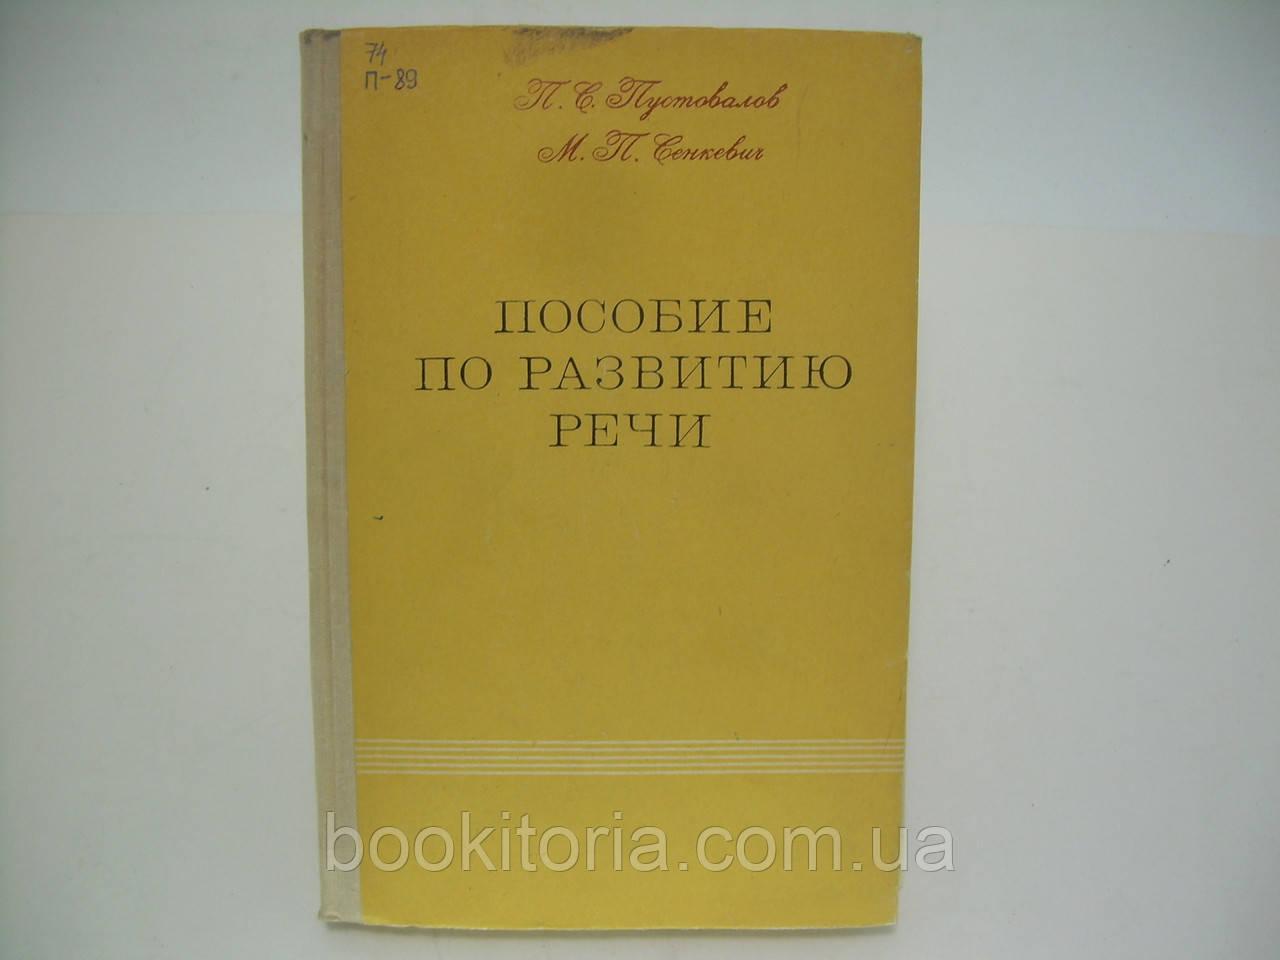 Пустовалов П.С., Сенкевич М.П. Пособие по развитию речи (б/у).